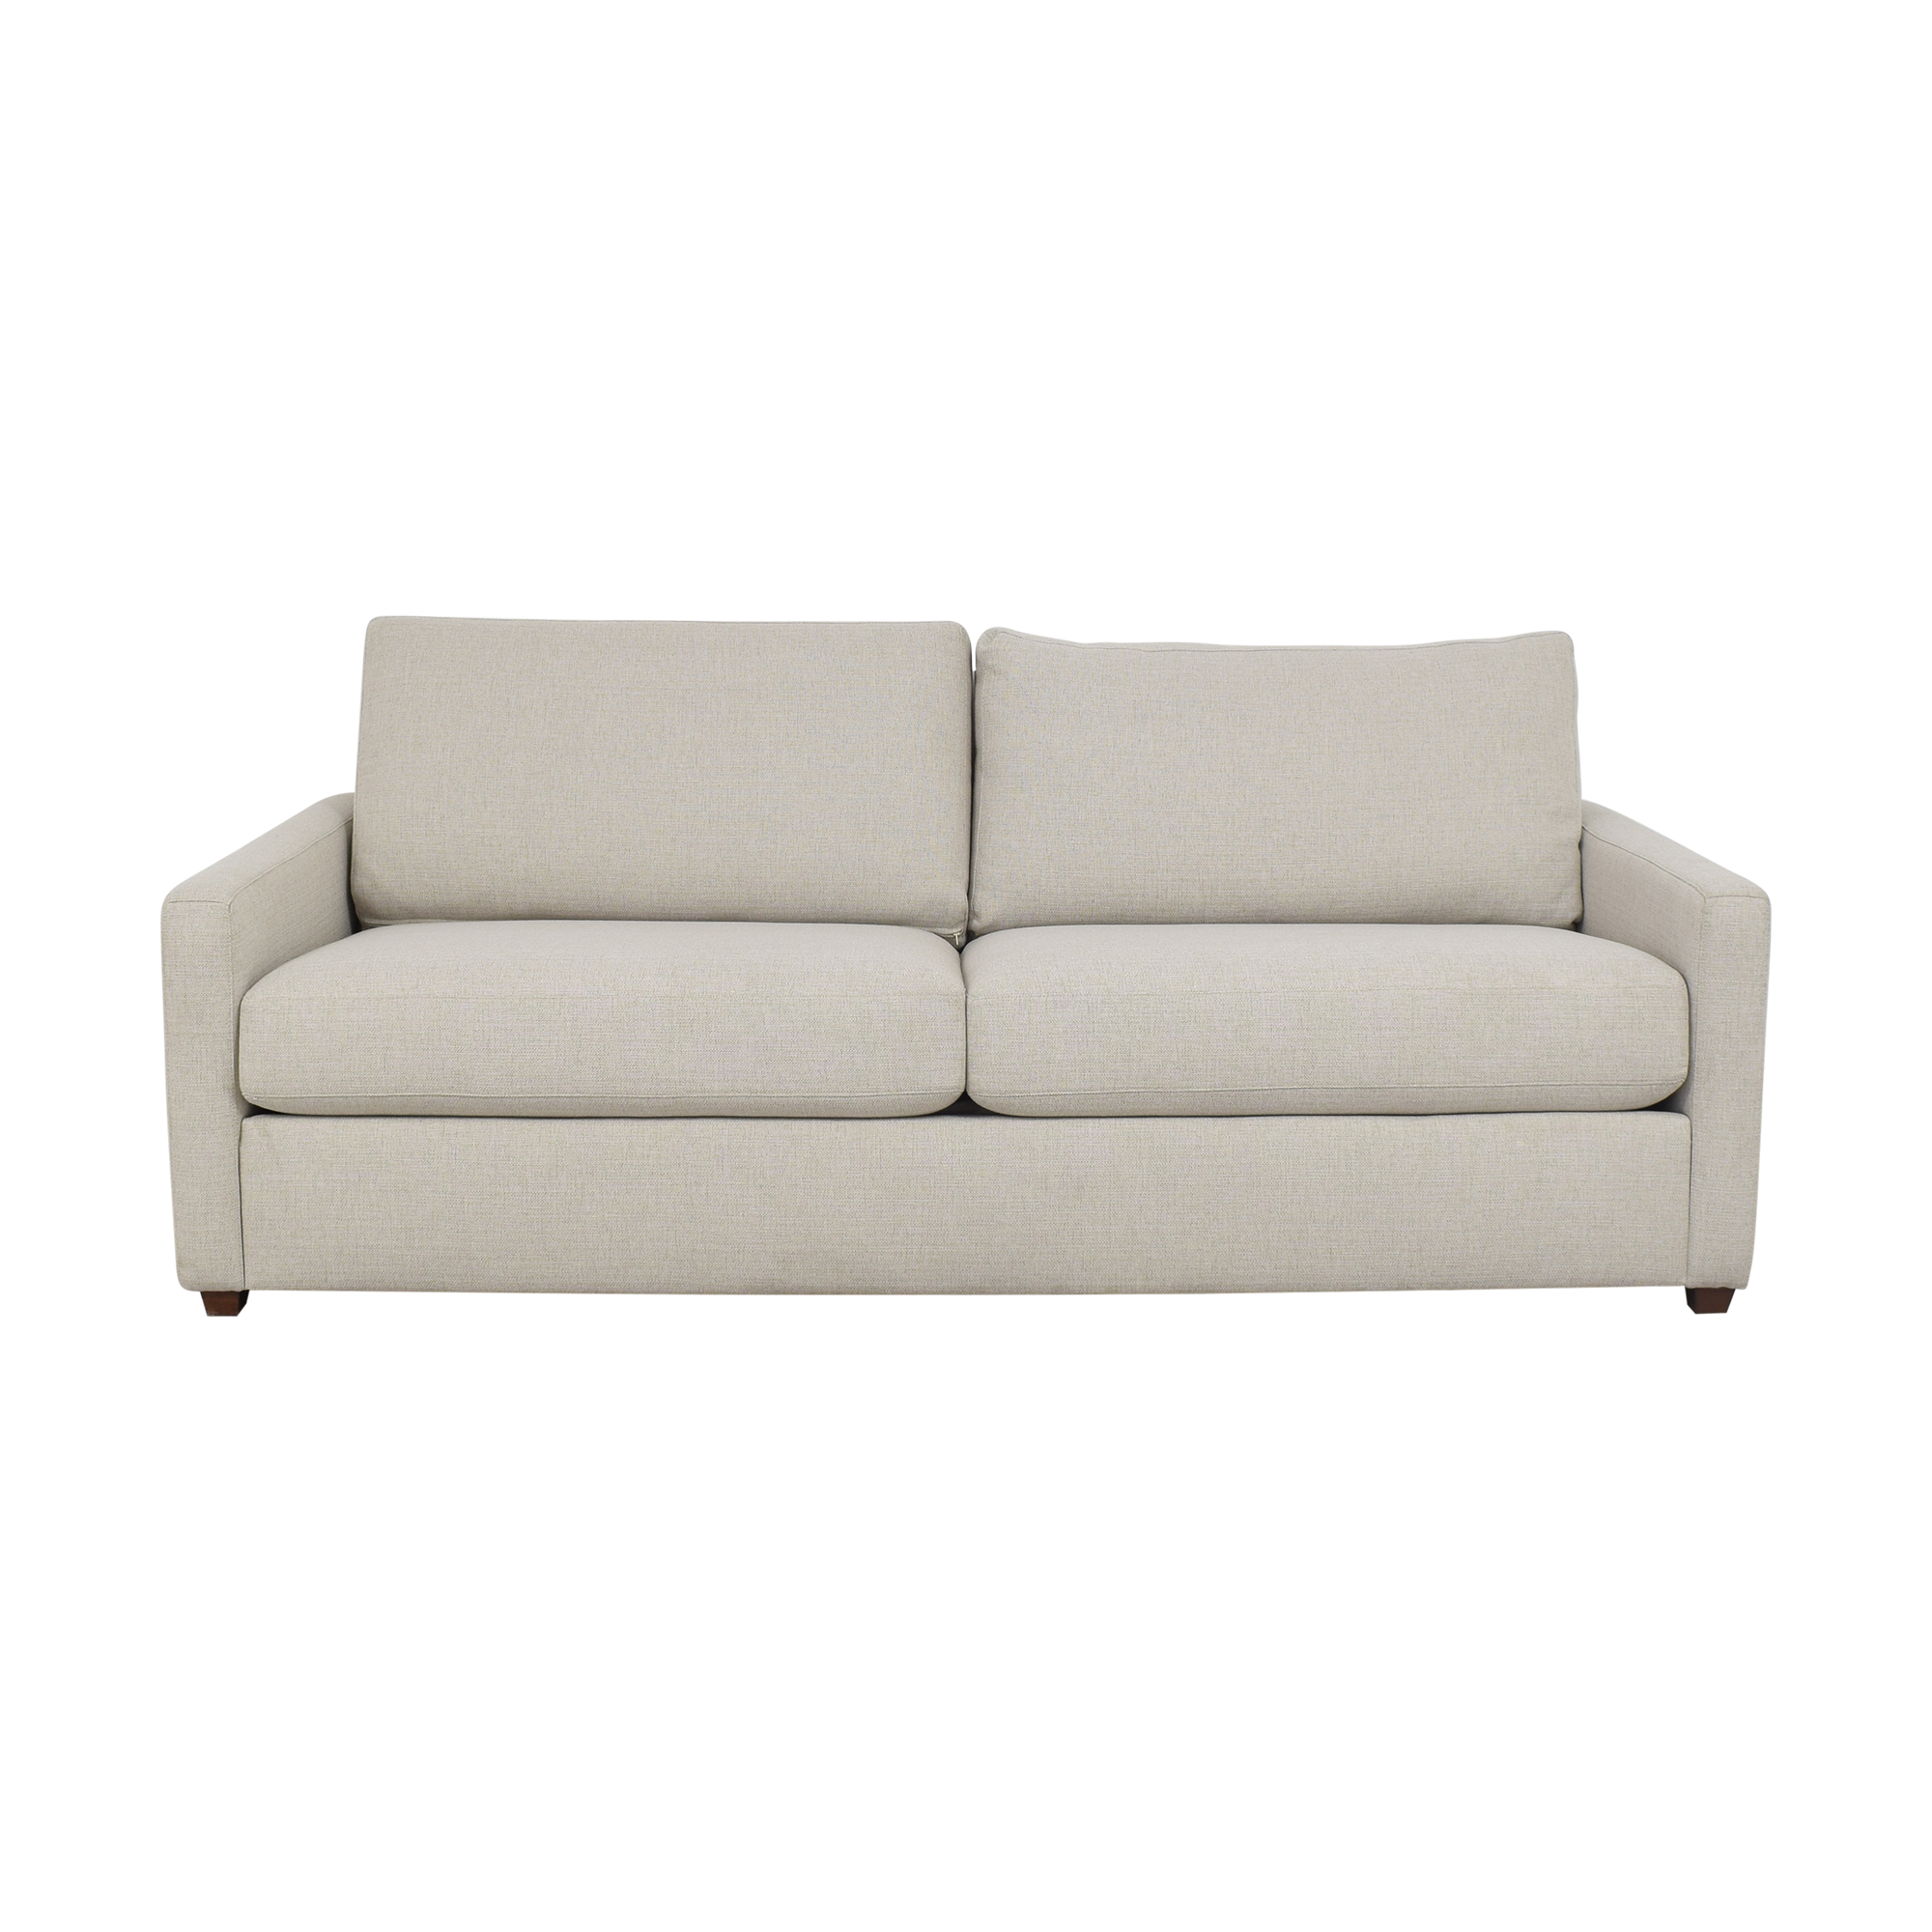 BenchMade Modern BenchMade Modern Couch Potato Lite Sofa